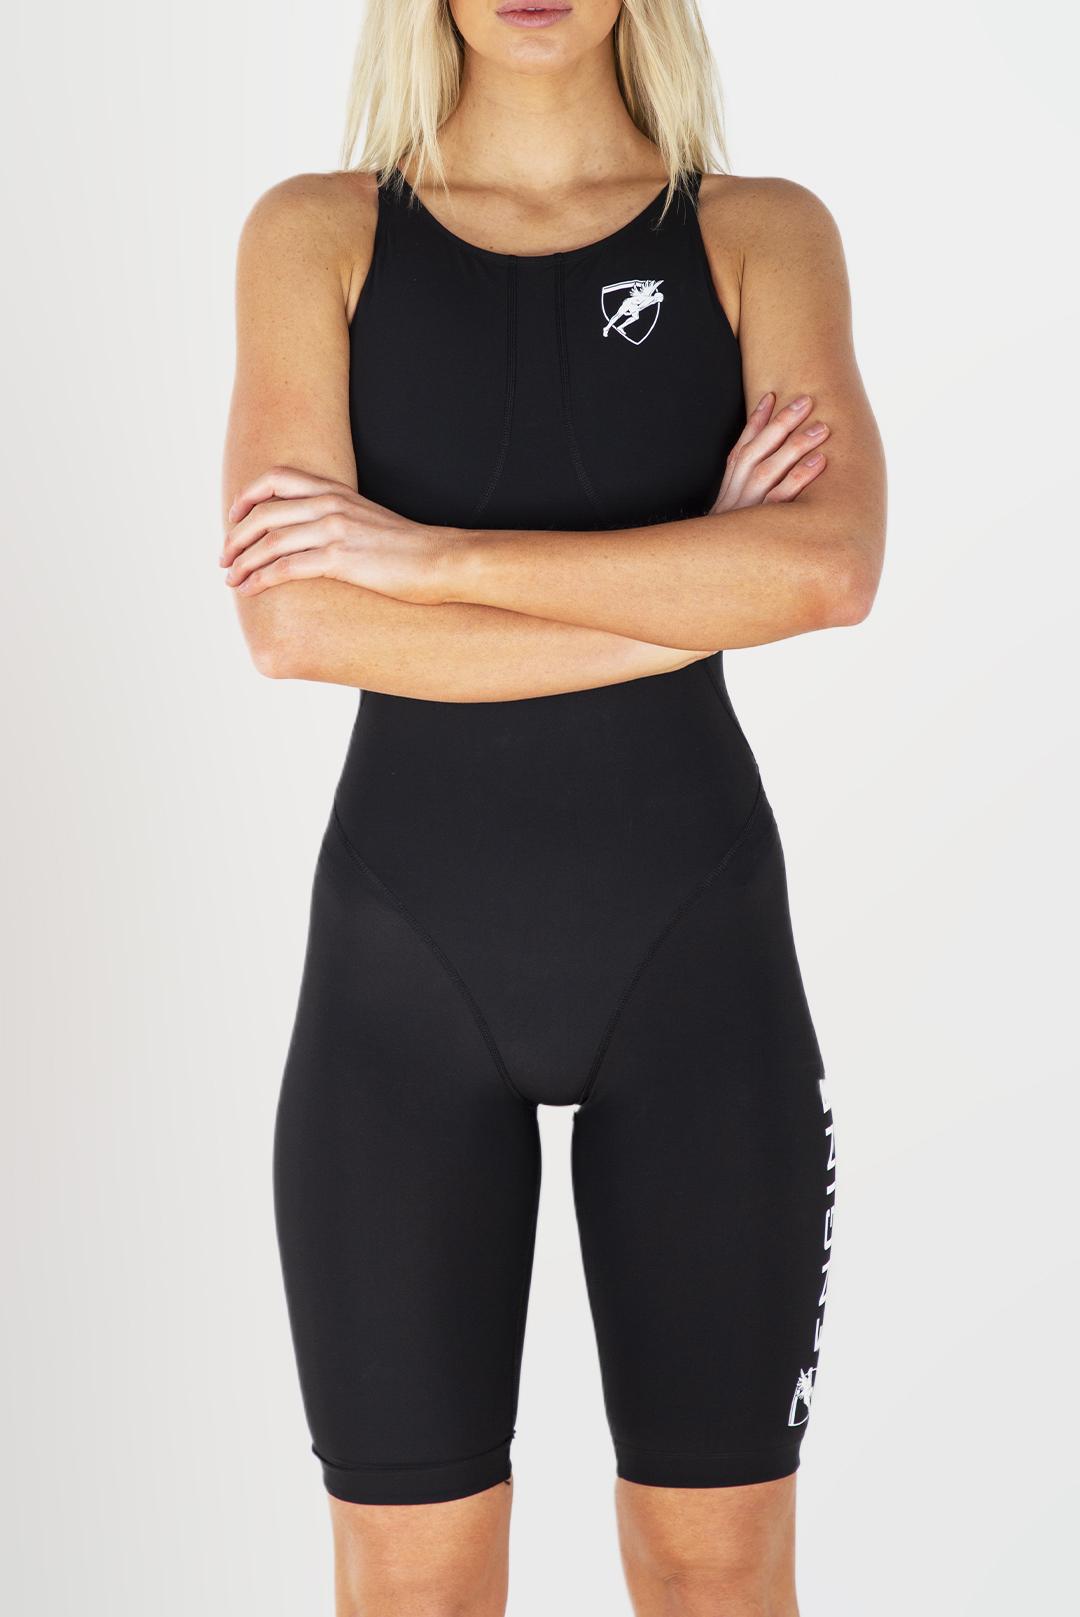 Shredskin Pro Female - Solid Black